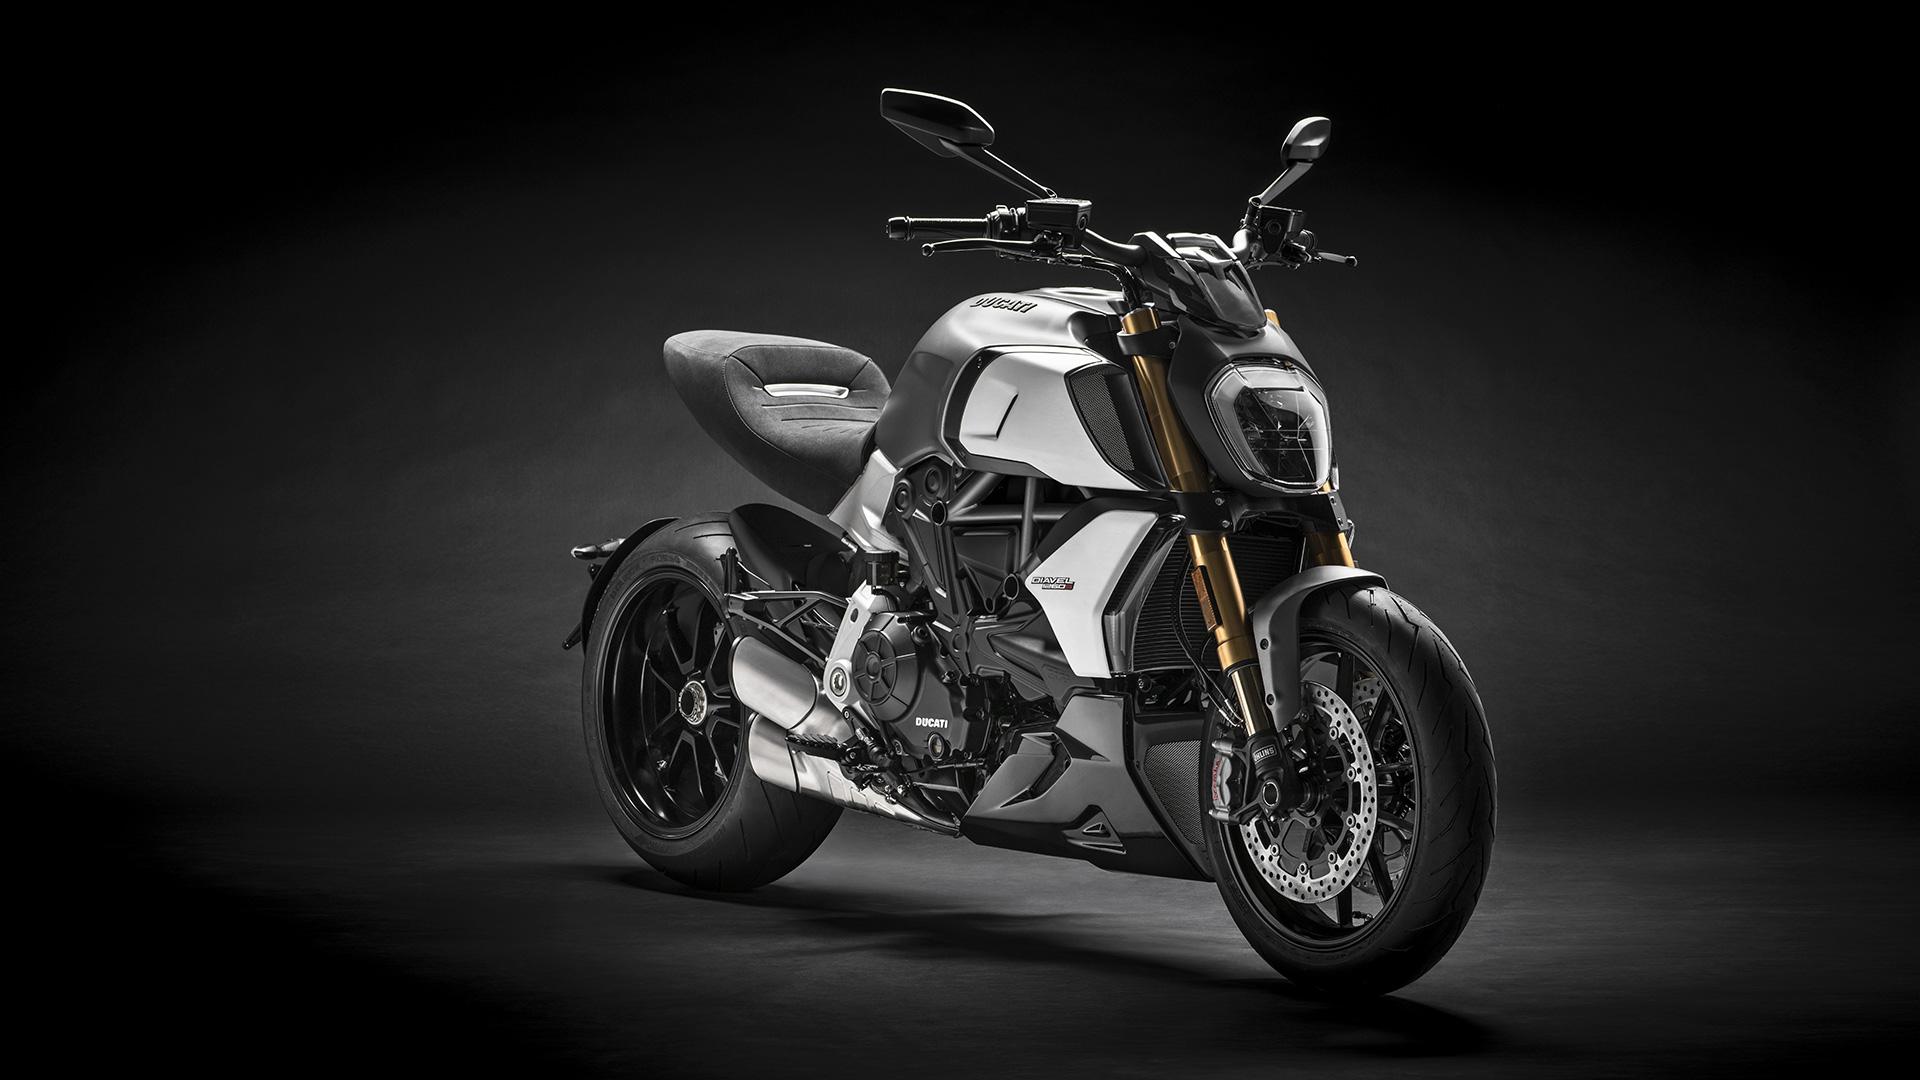 2020 Ducati Diavel 1260 / 1260 S